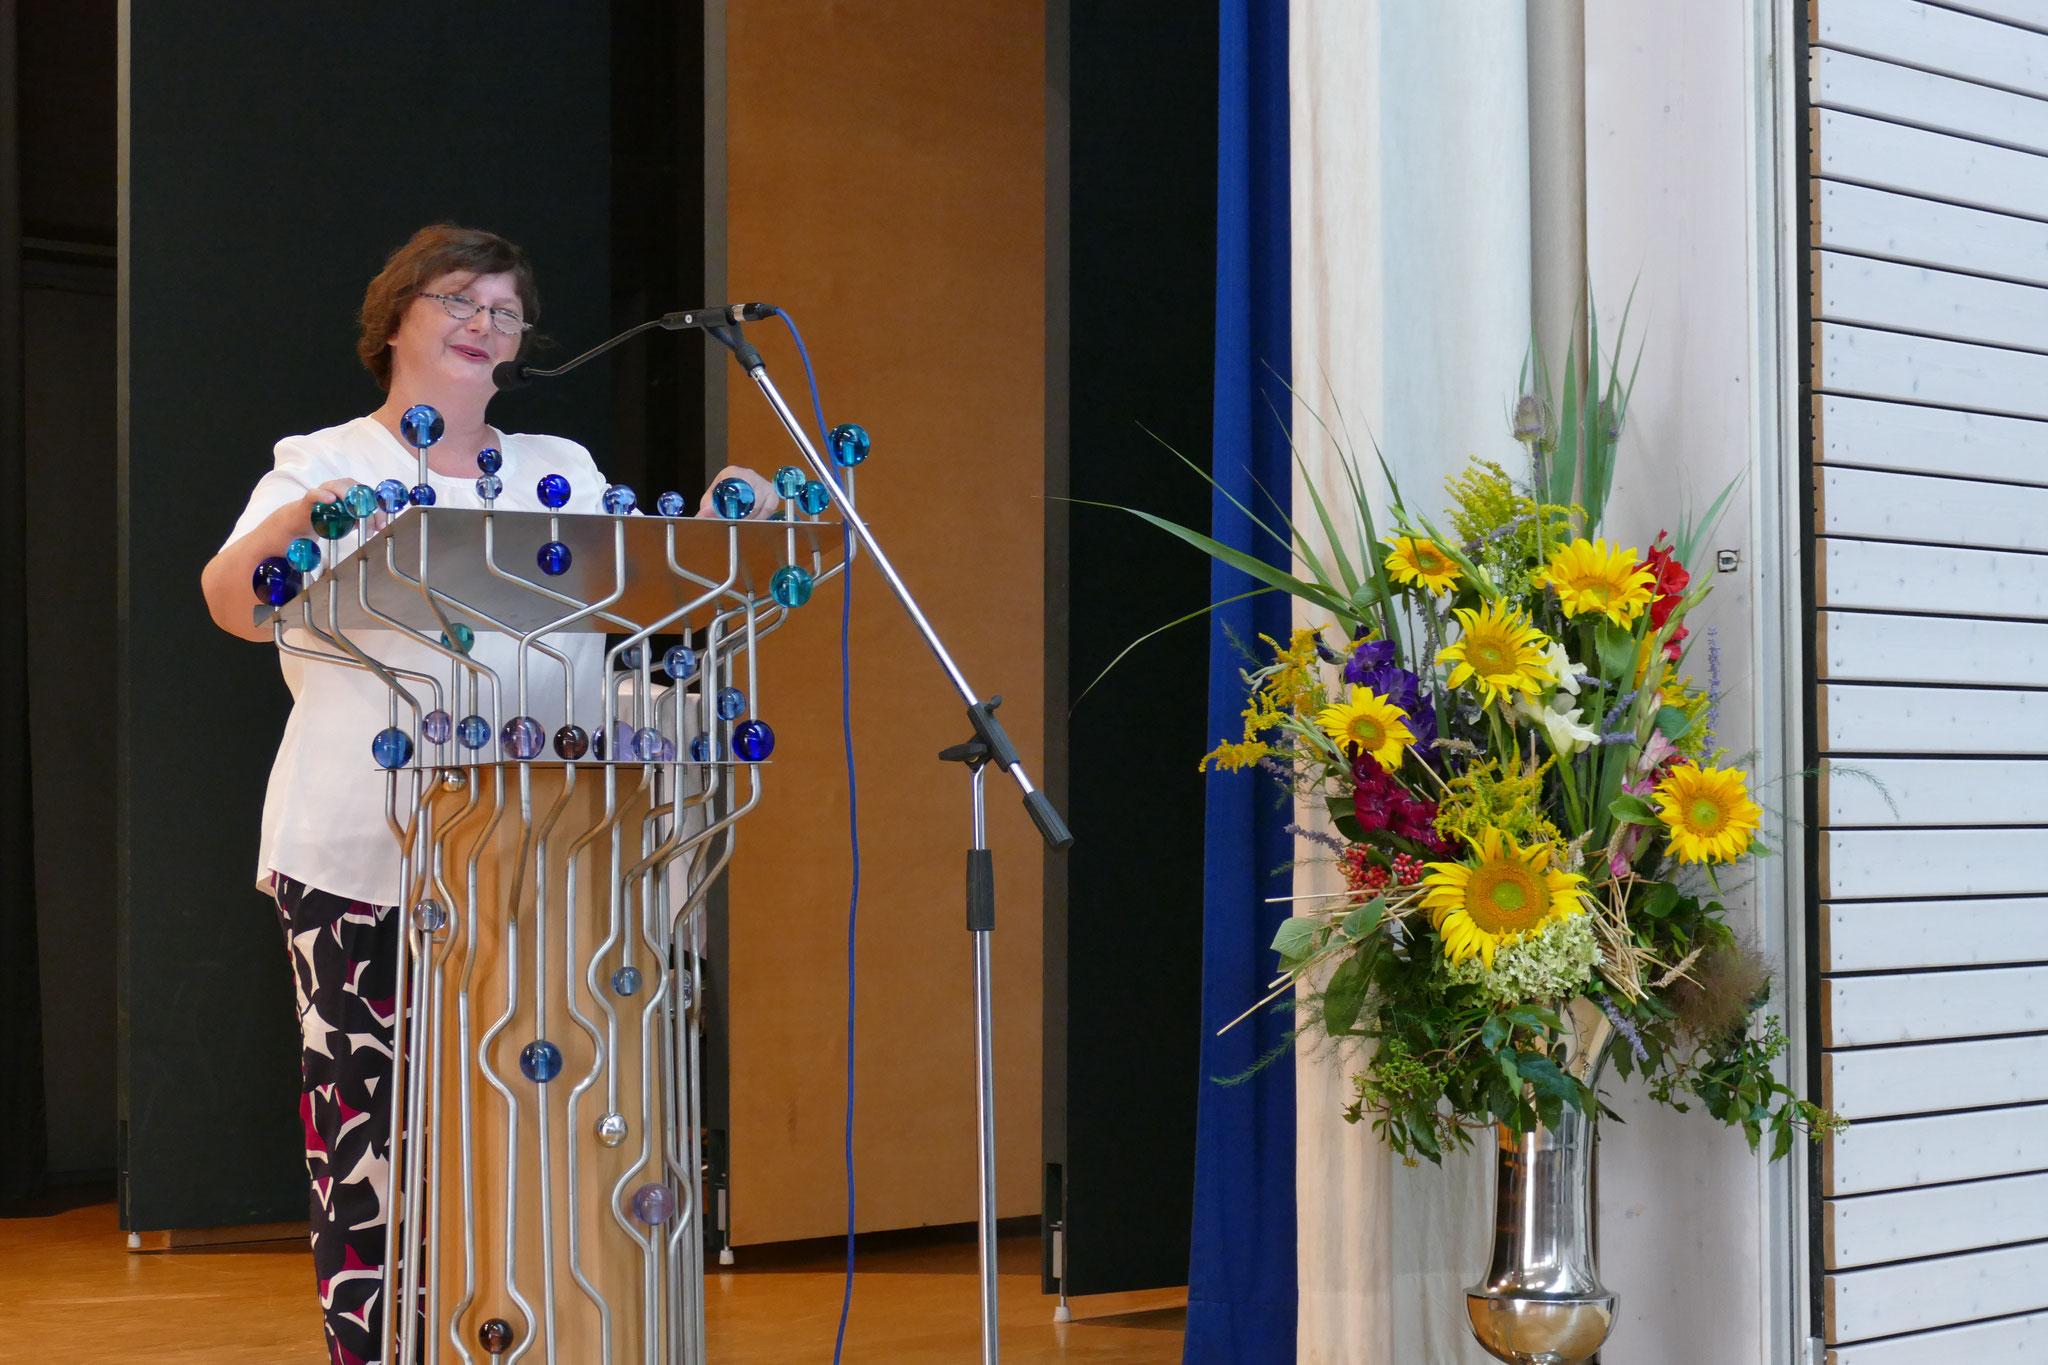 Begrüßungsworte der Konrektorin Edith Scharm